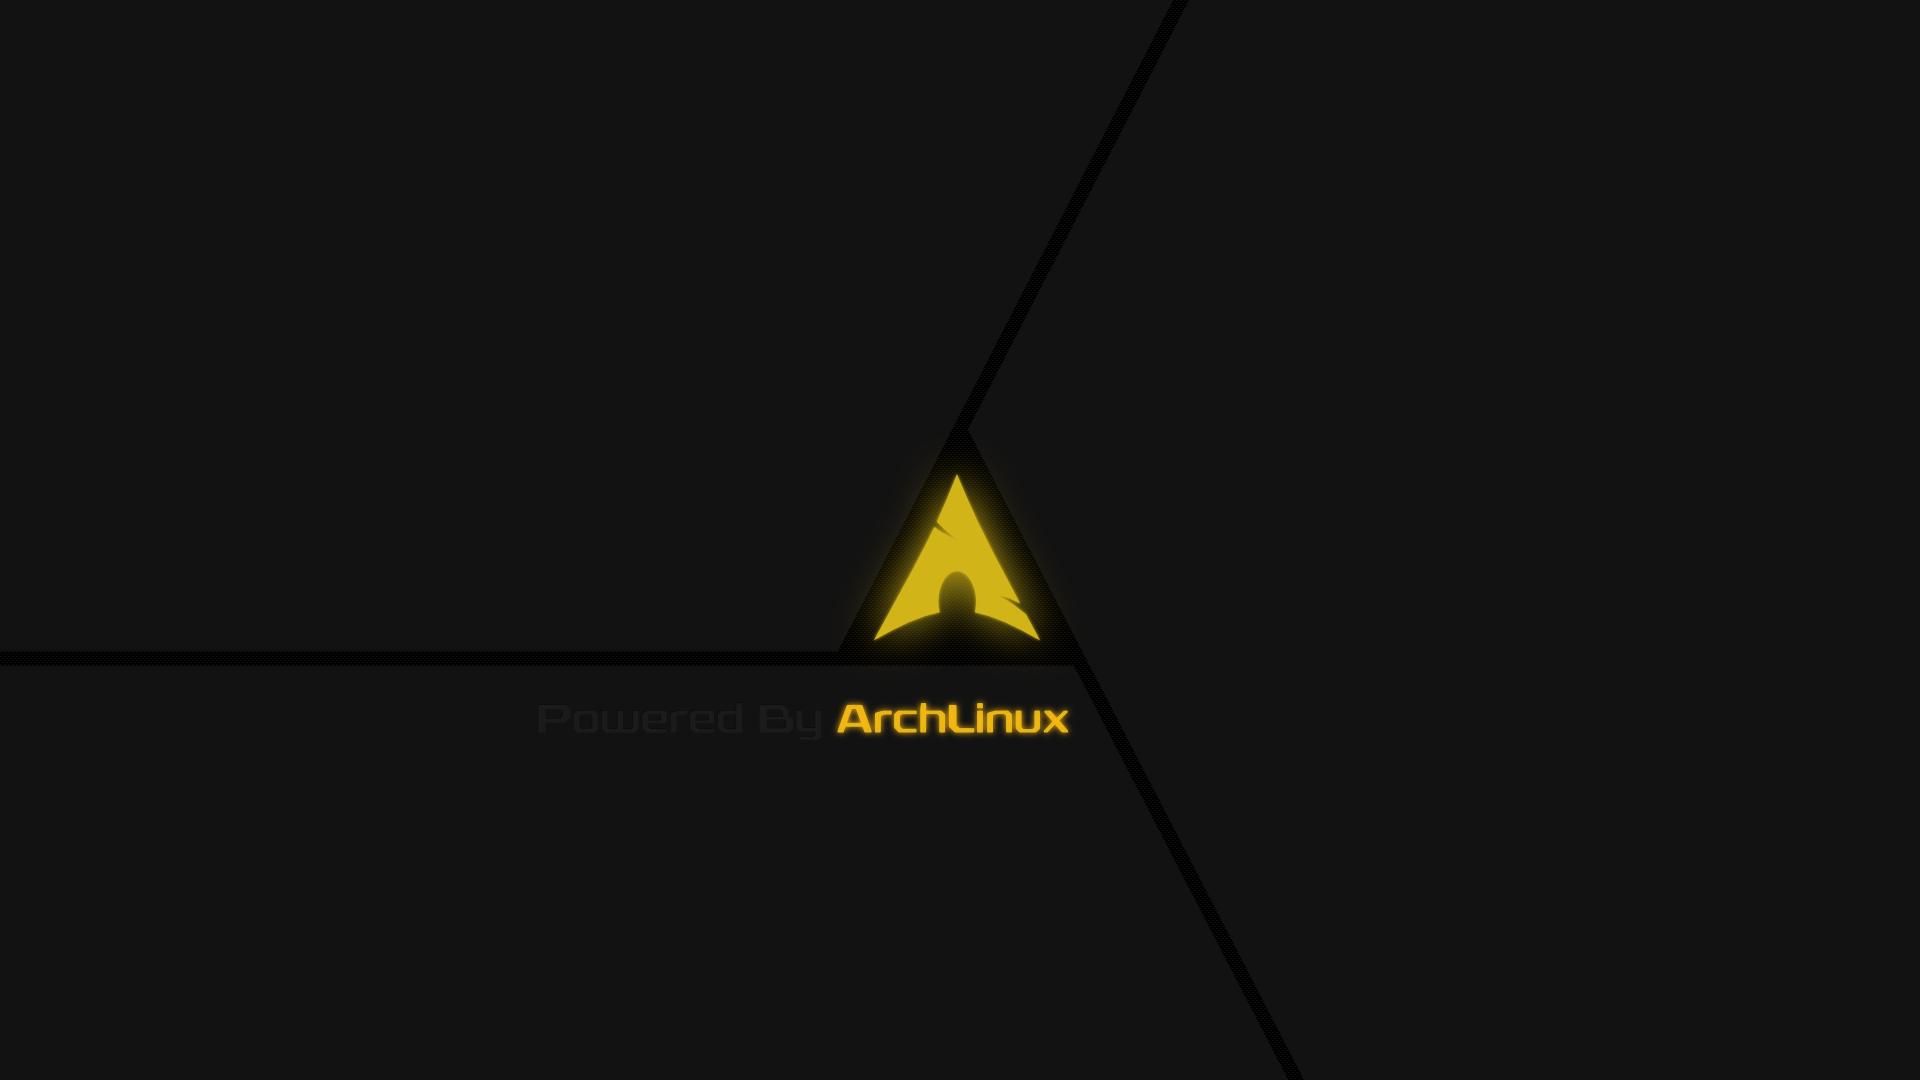 Arch Linux wallpaper 142141 1920x1080